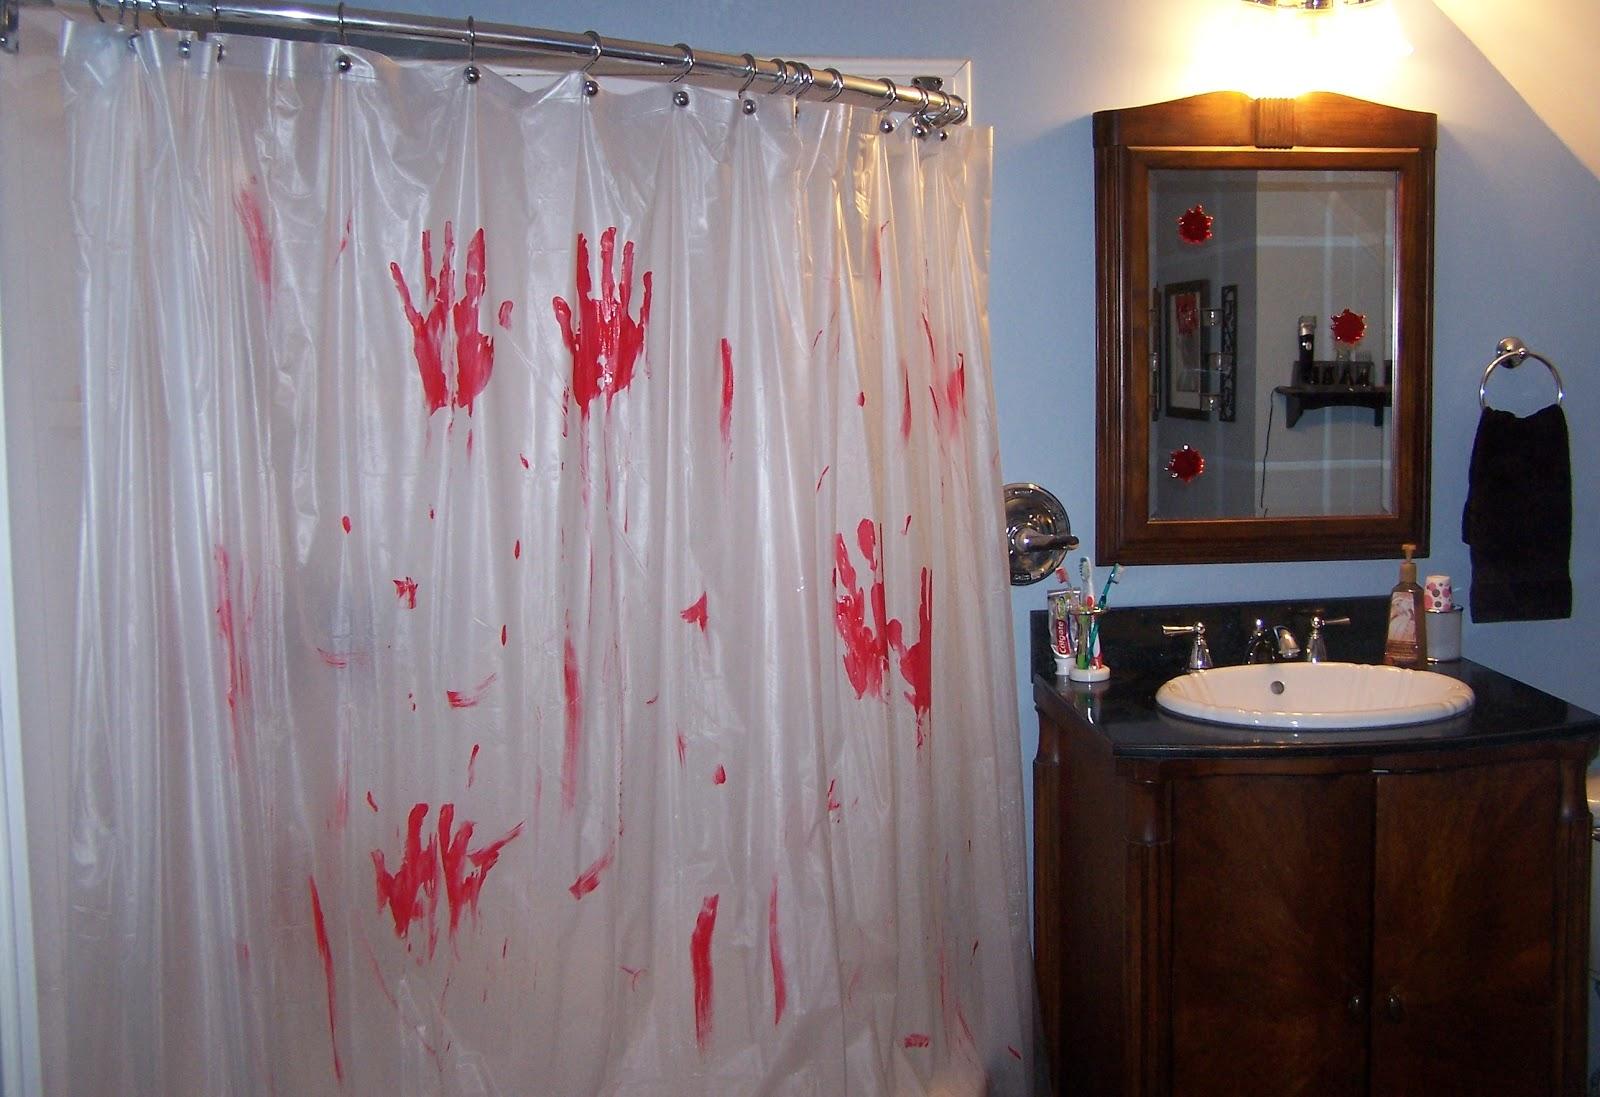 Halloween bathroom decorations - Halloween Bathroom Decorations